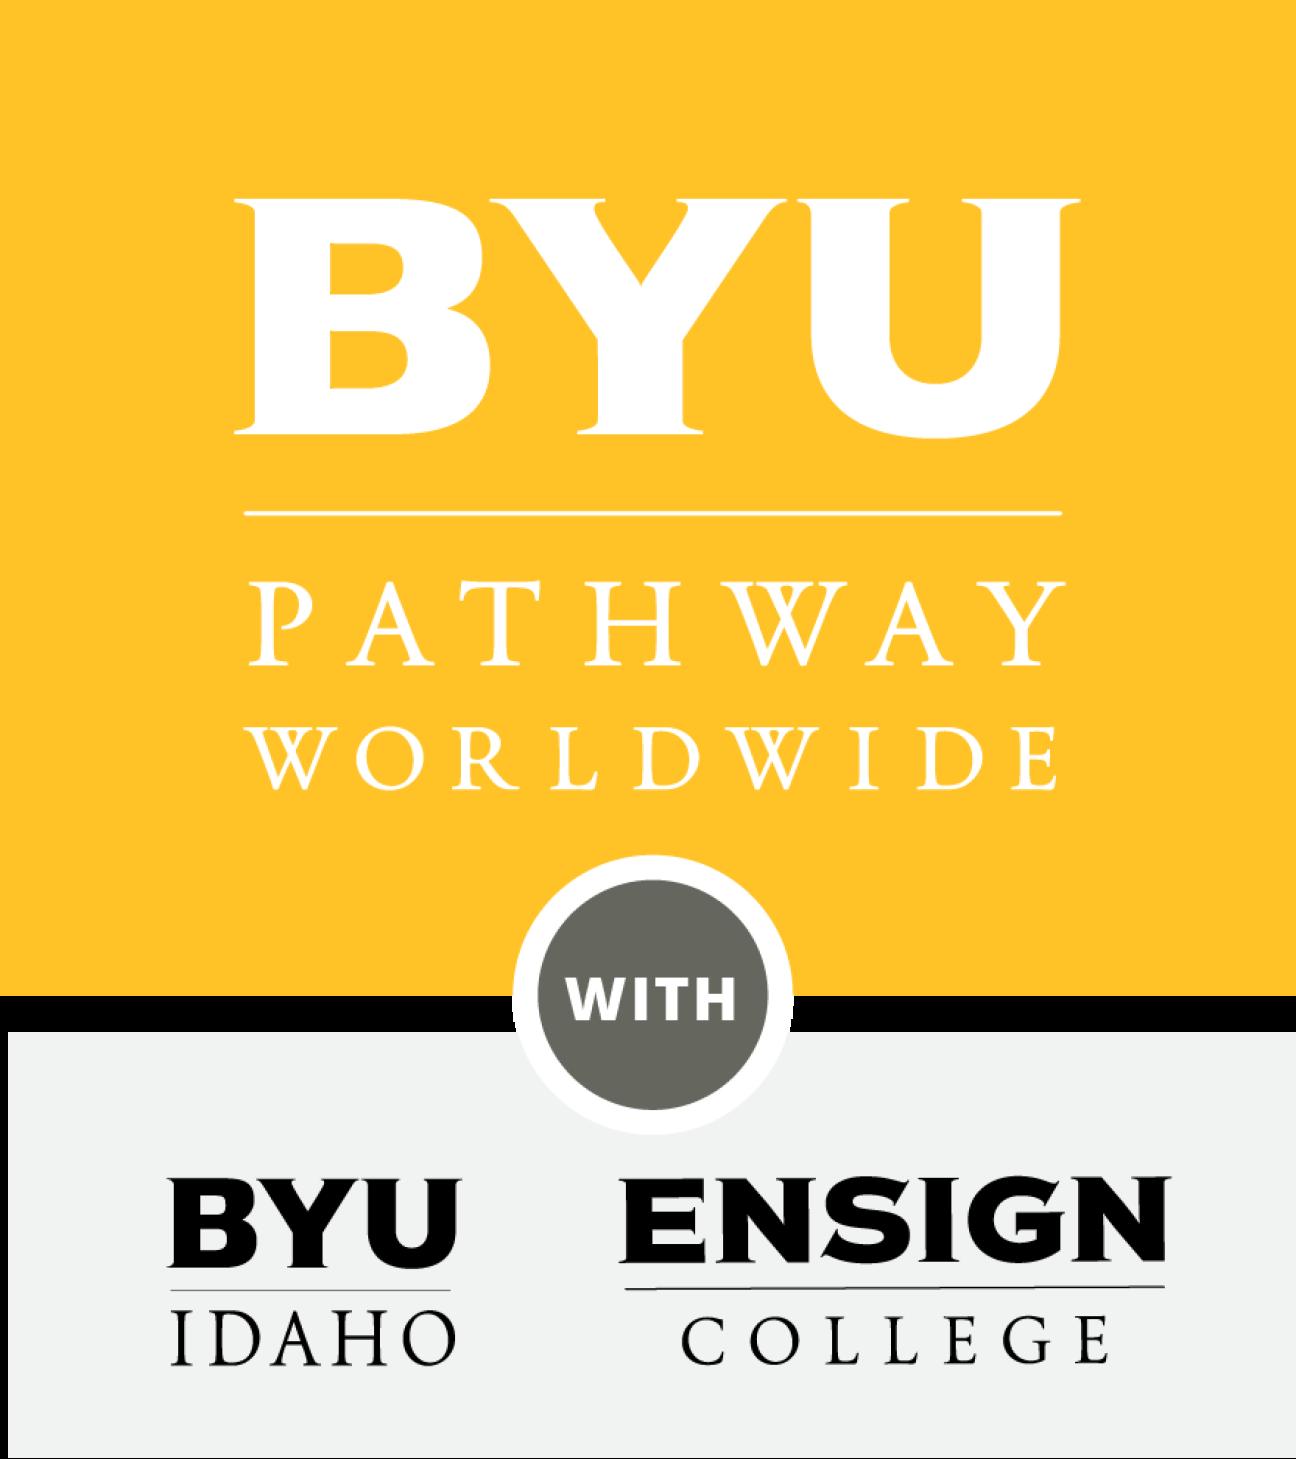 BYU-Pathway + BYU-Idaho + Ensign (Vertical)